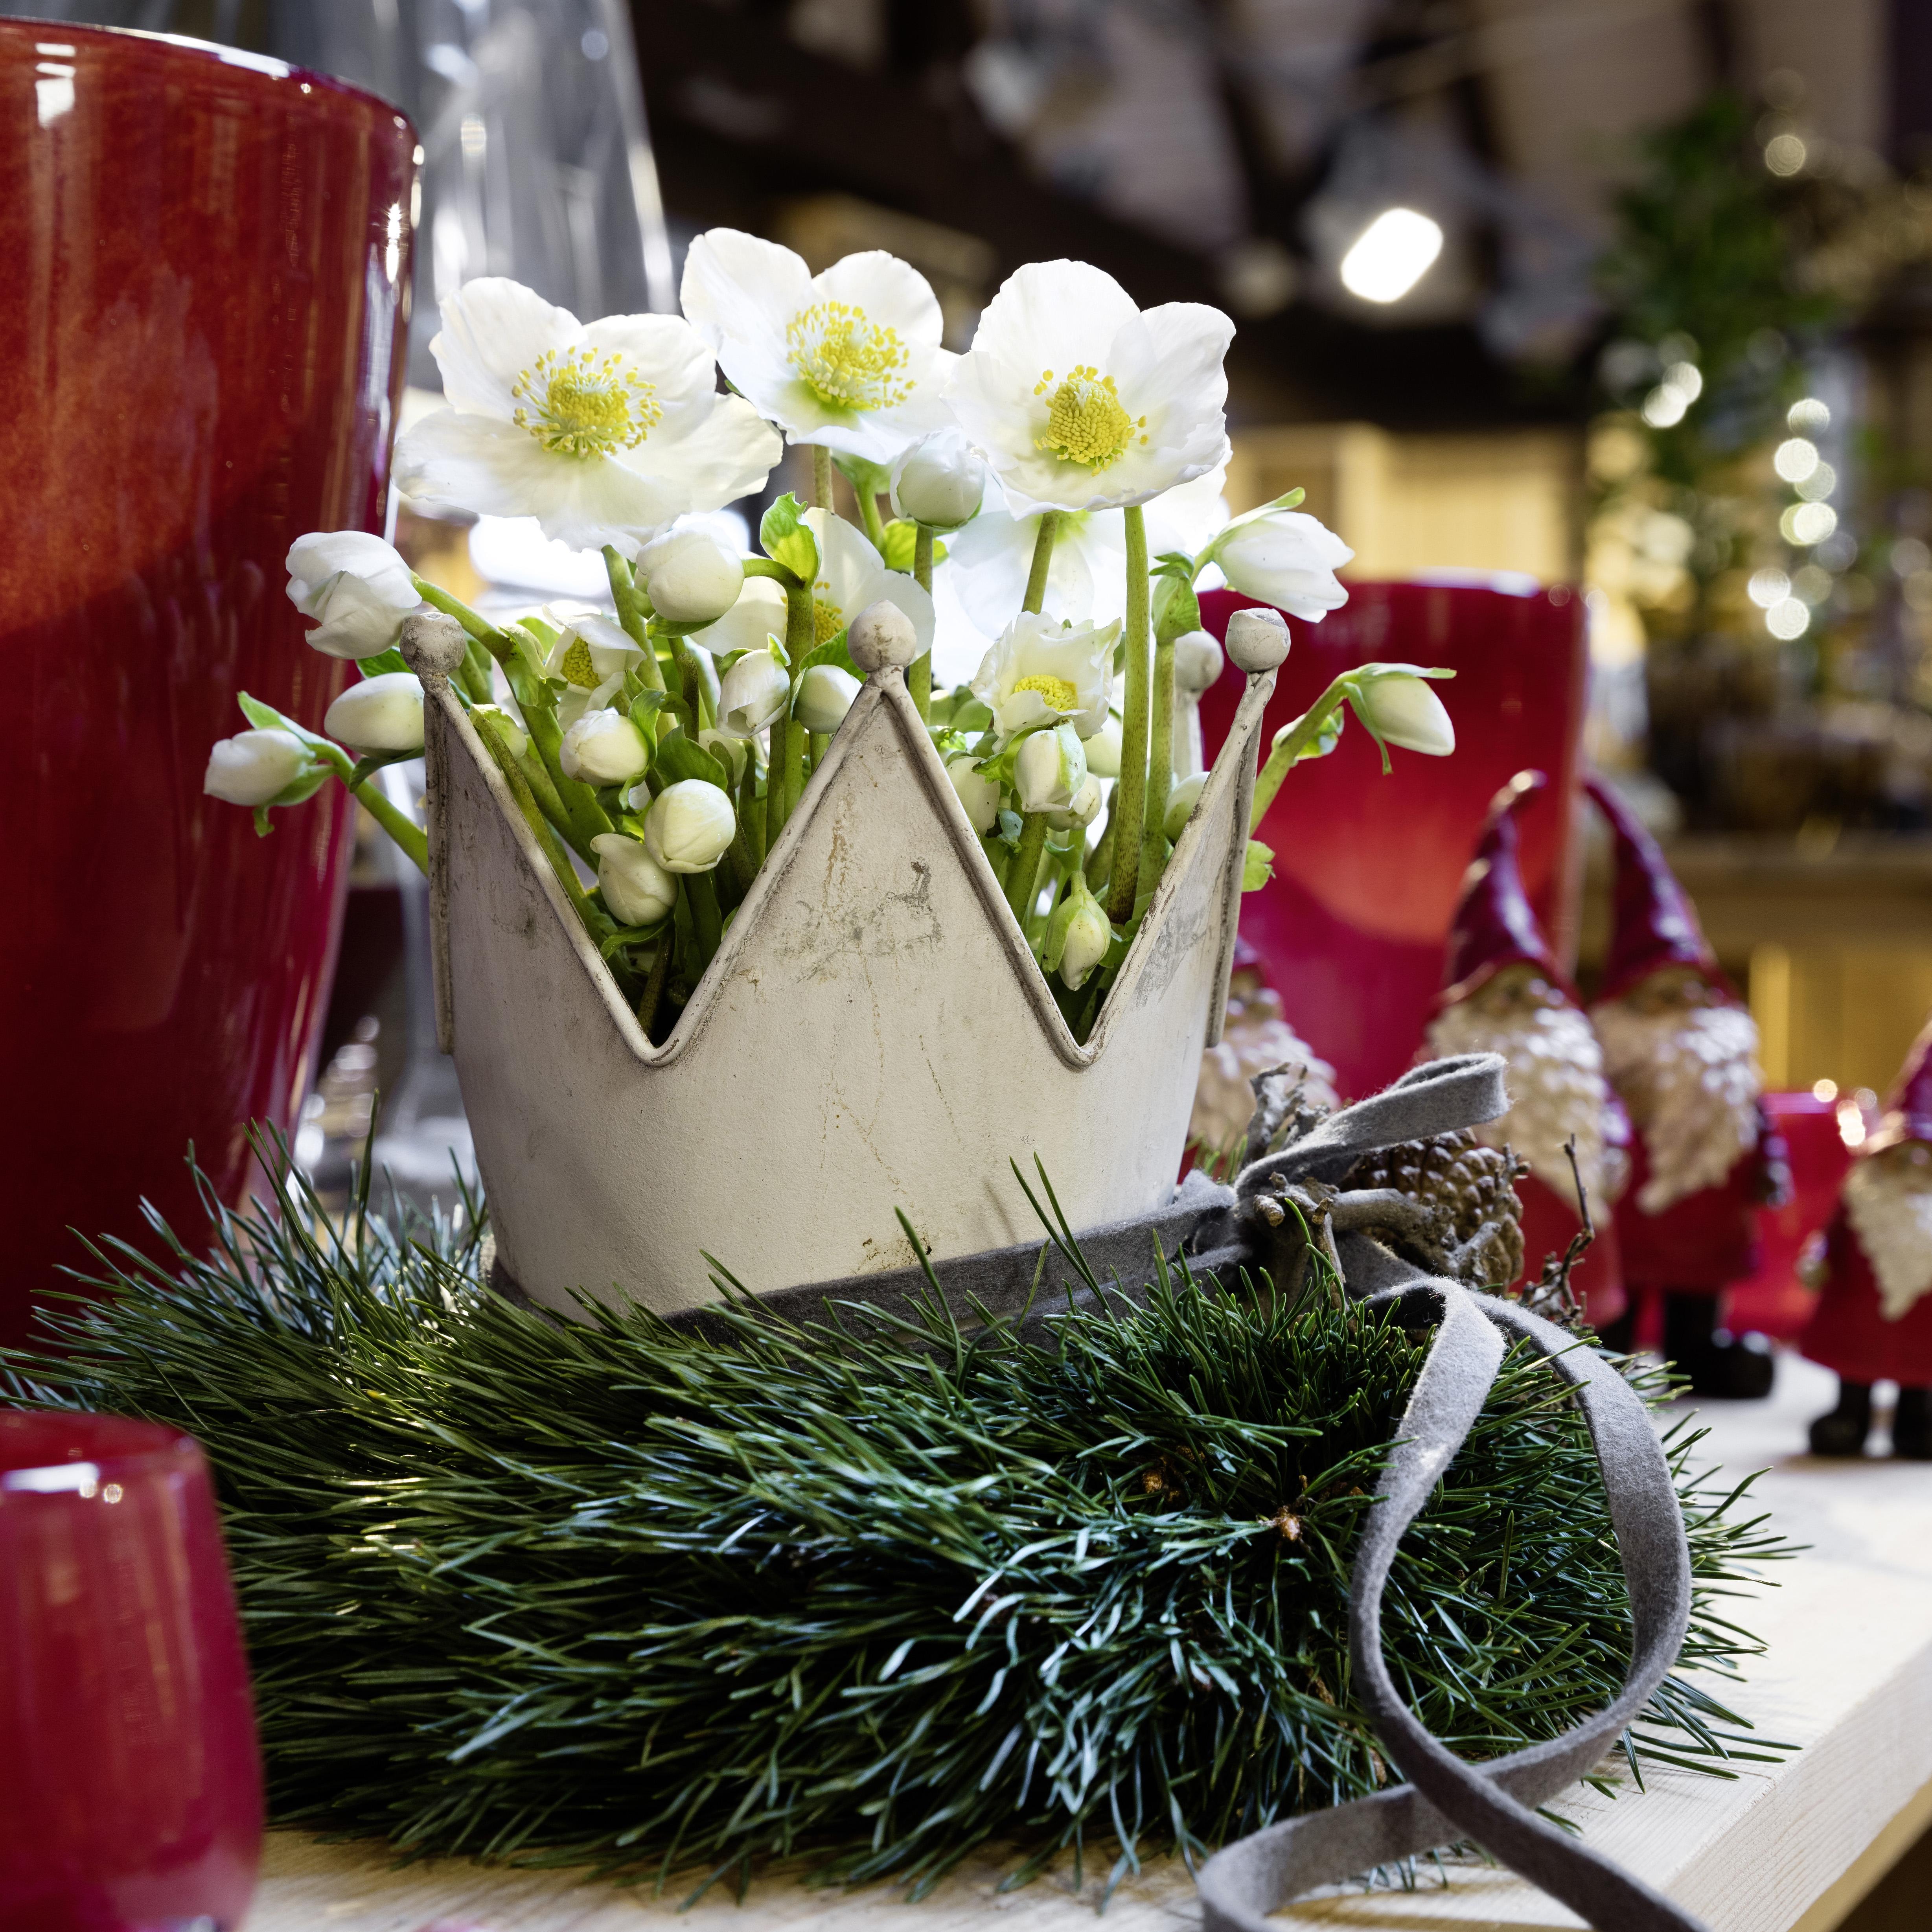 White Christmas | Heuger Gartenbaubetriebe